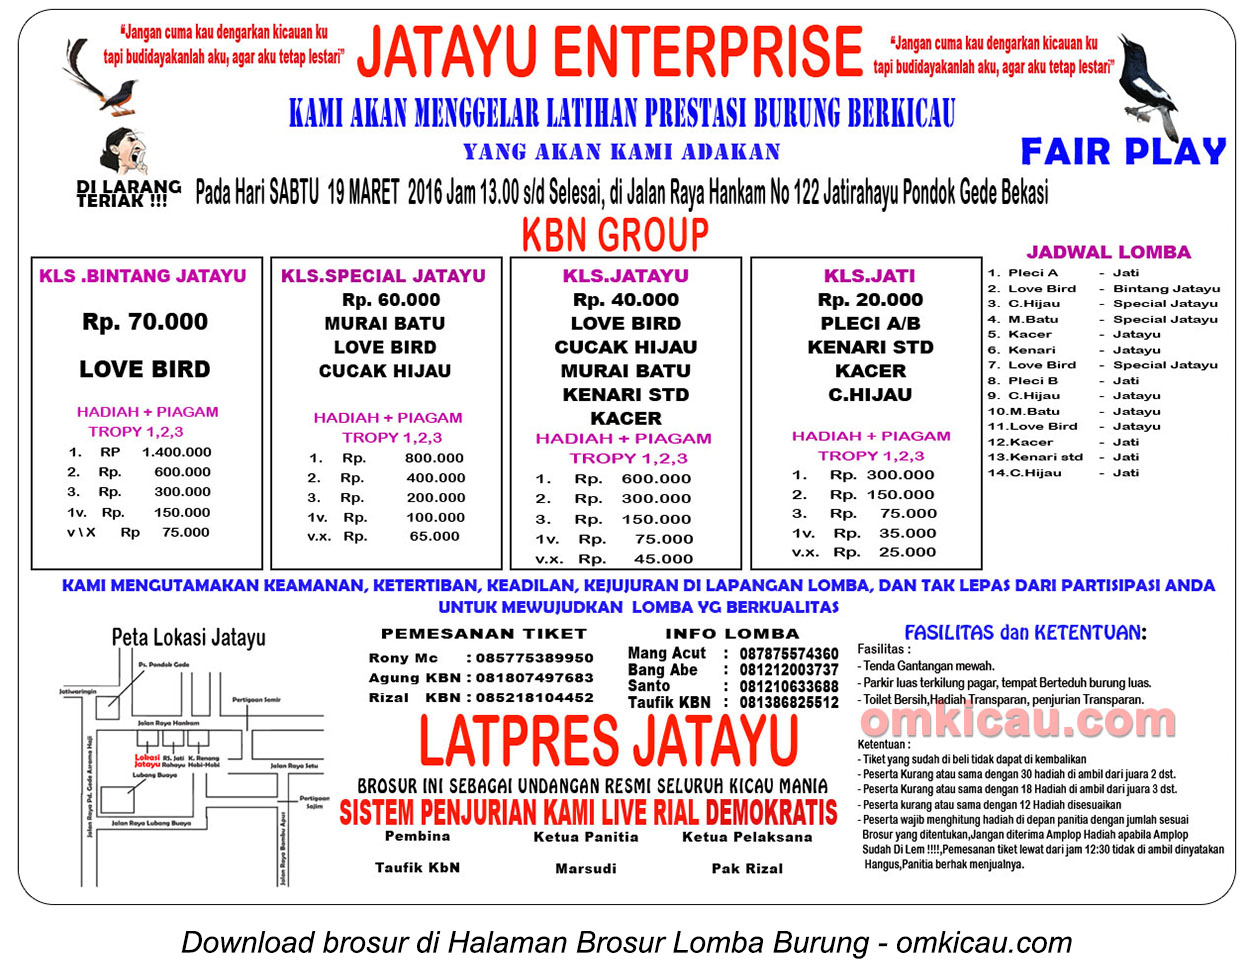 Brosur Latpres Burung Berkicau Jatayu Enterprise, Bekasi, 19 Maret 2016